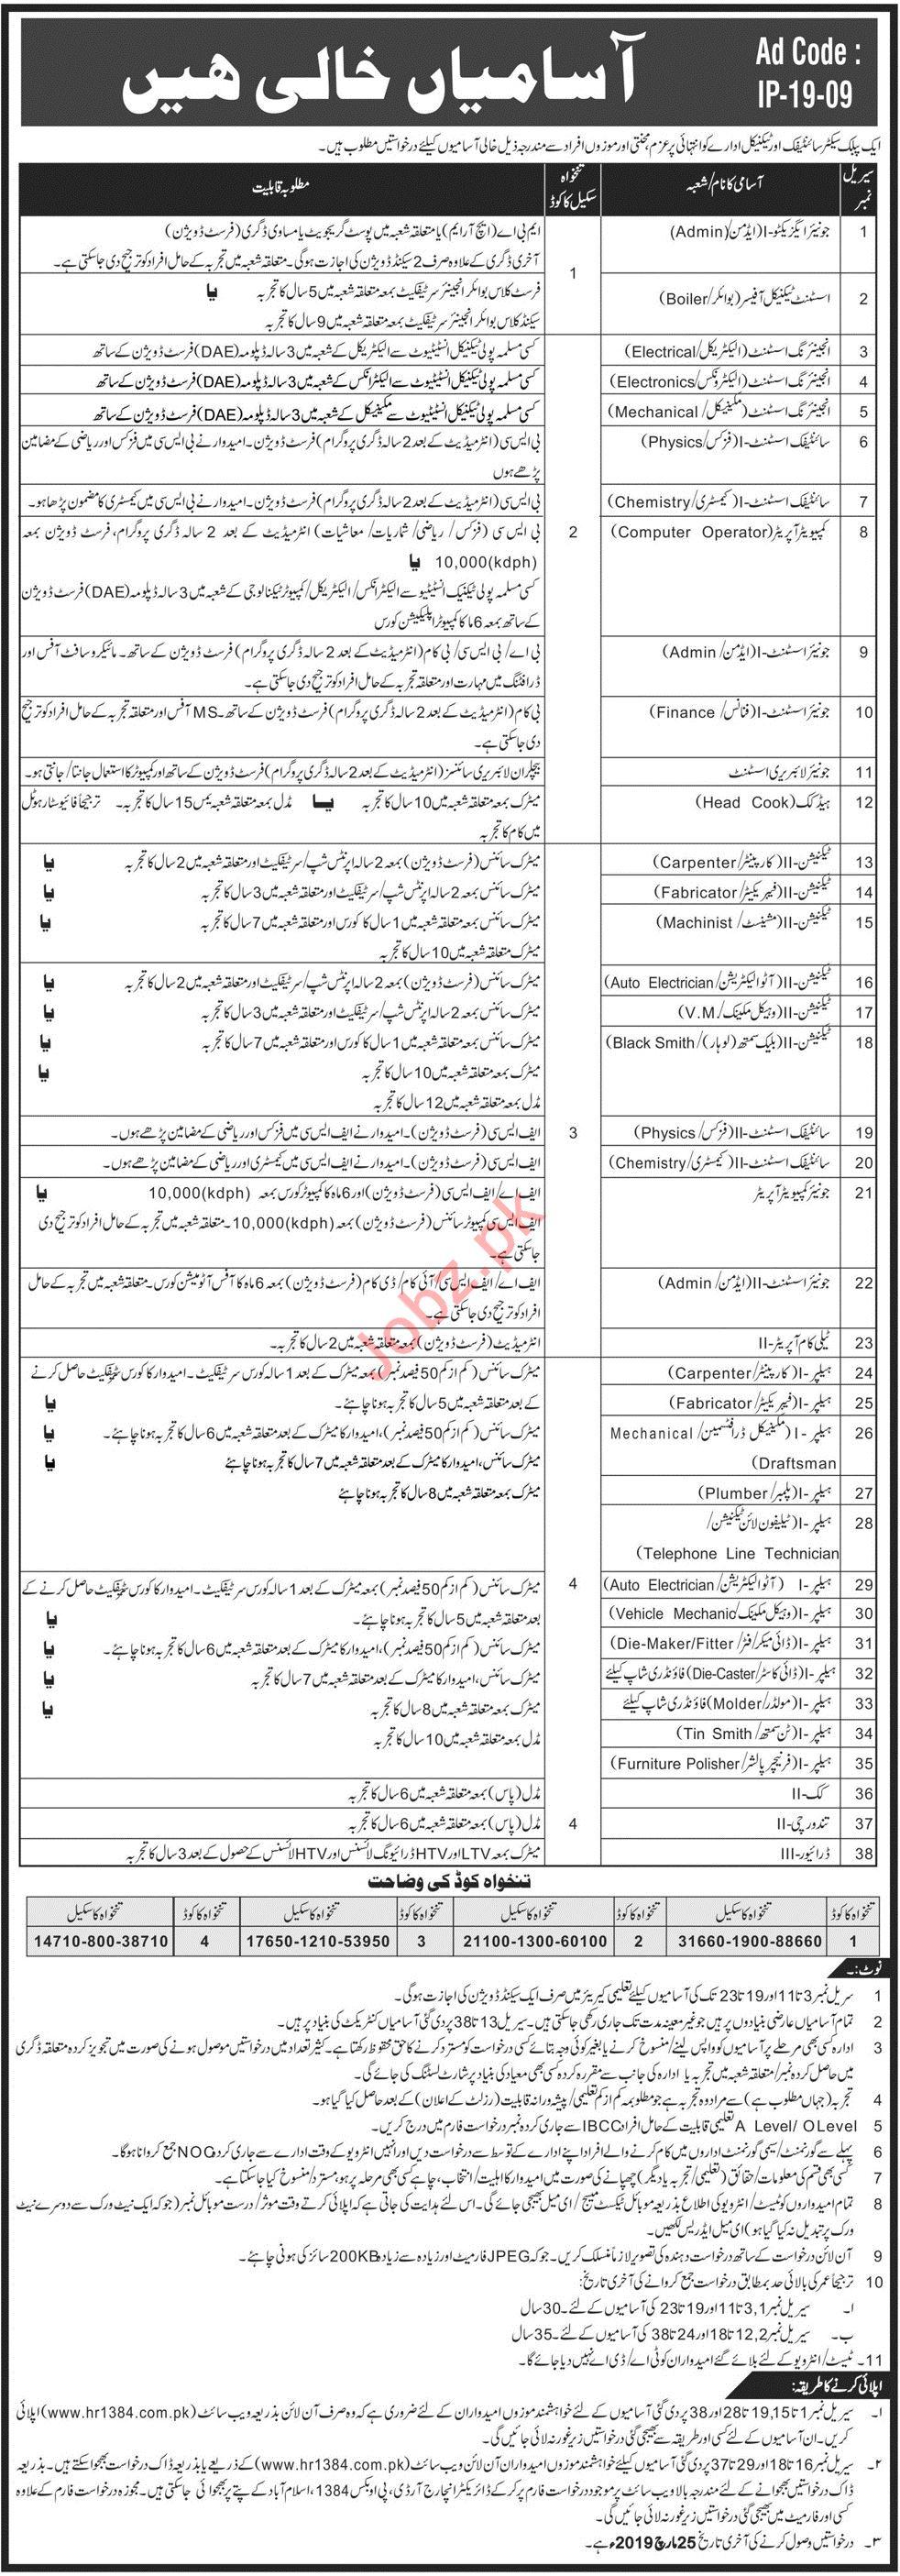 PAEC Pakistan Atomic Energy Commission Jobs 2019